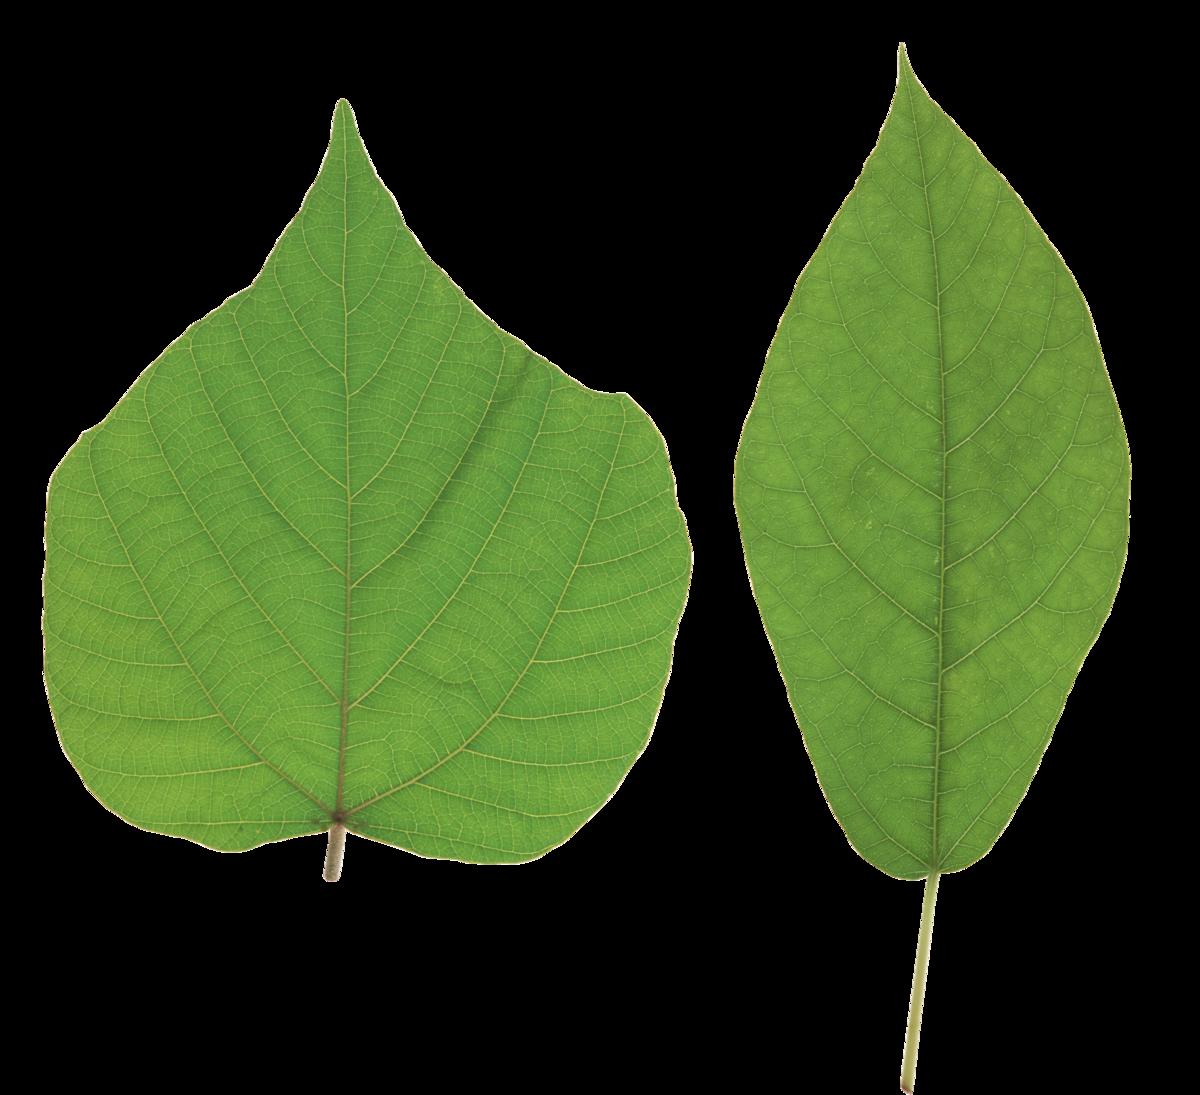 новичков листья широкие рисунок монро символ